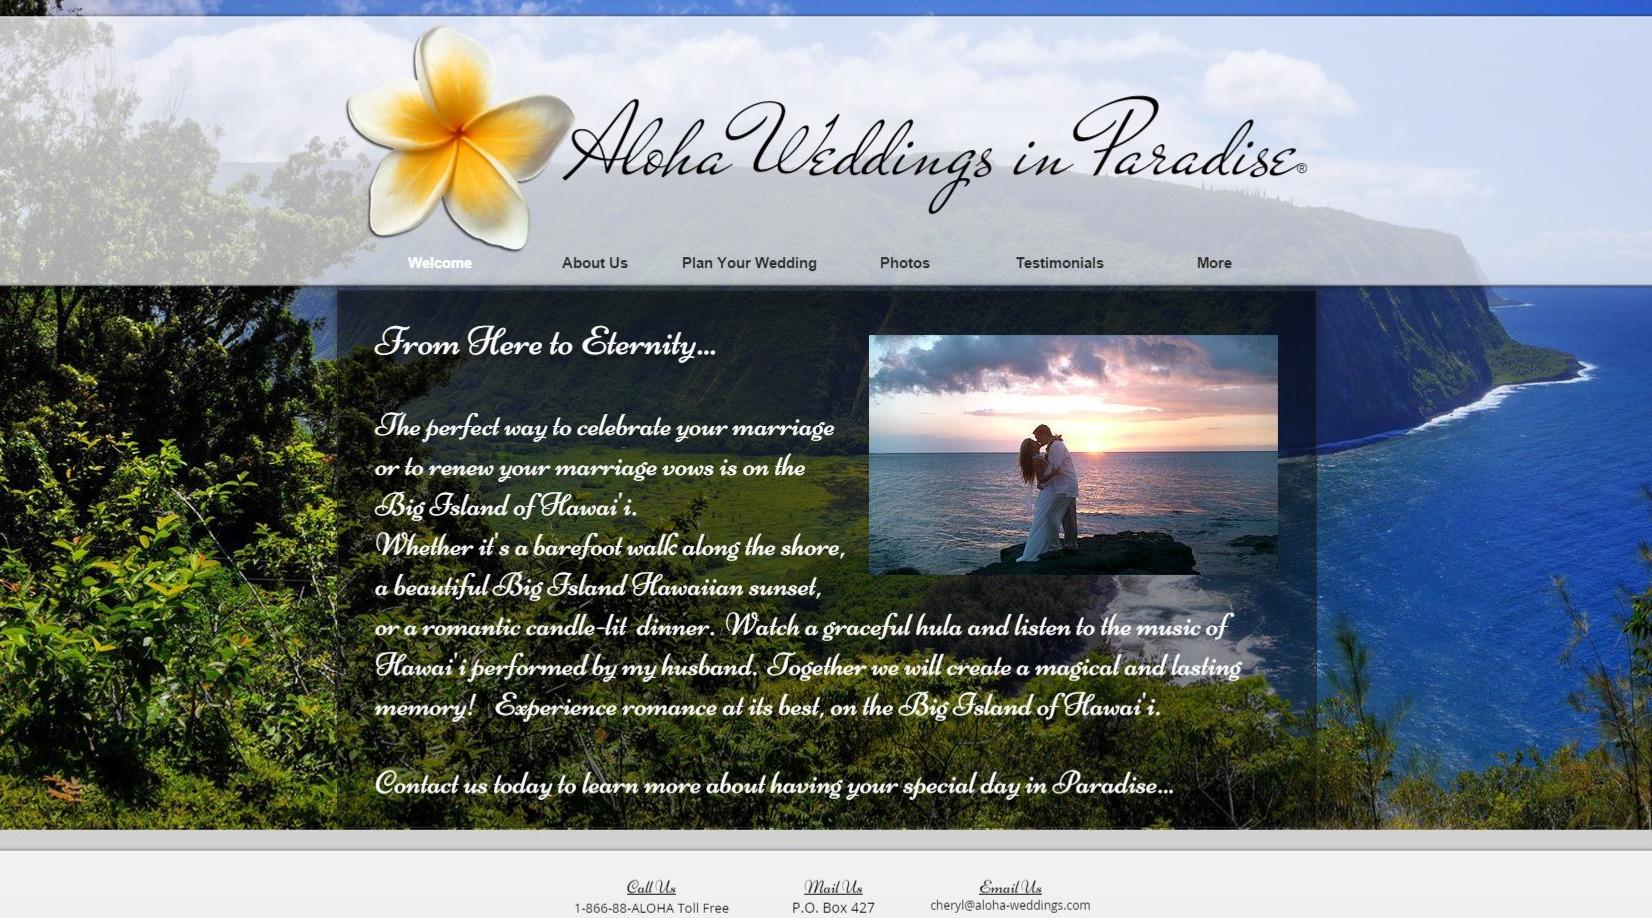 Aloha Weddings in Paradise_edited